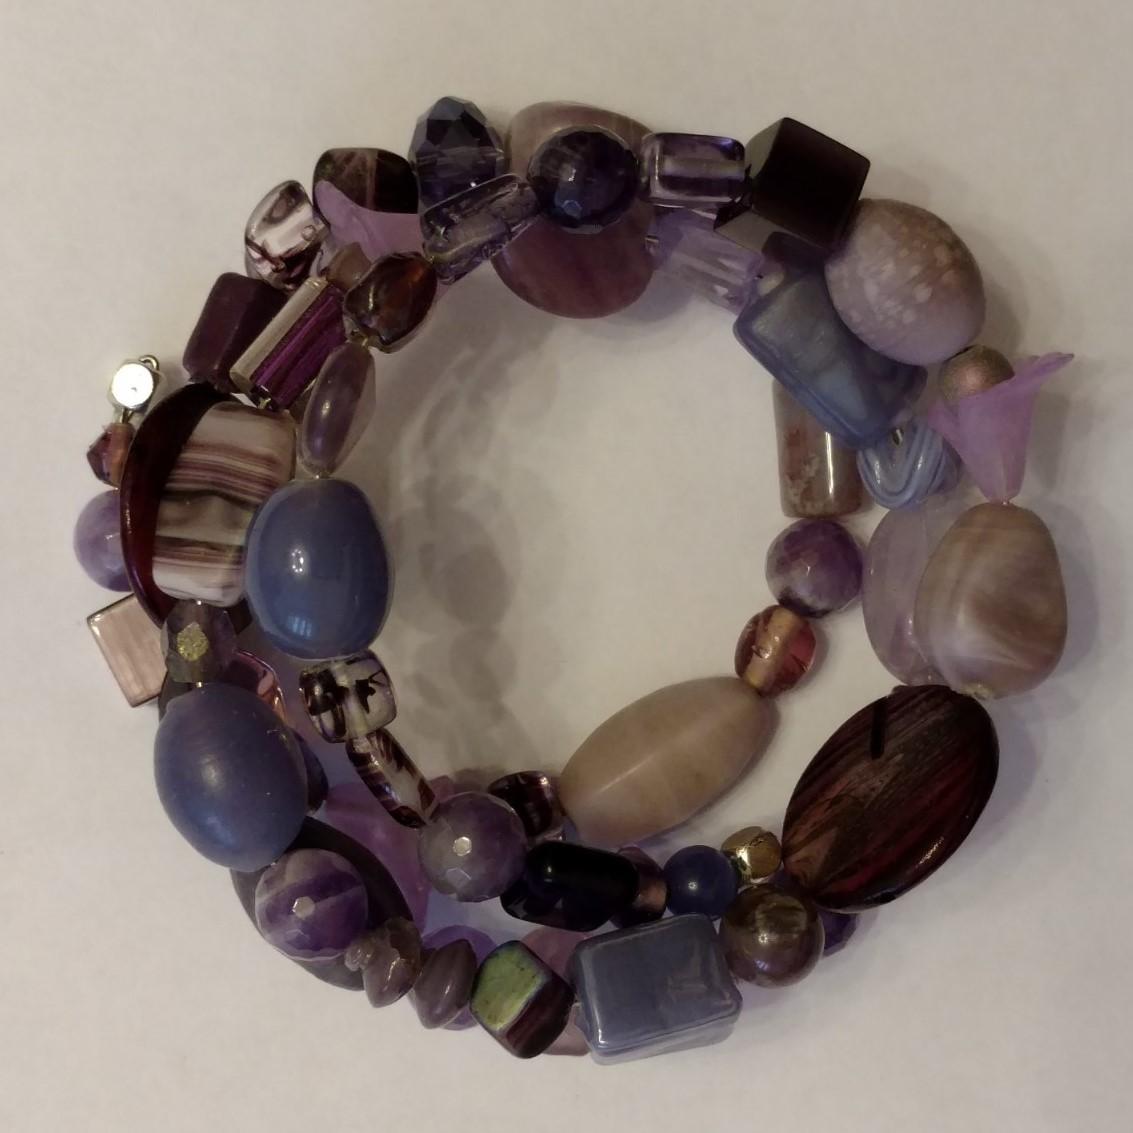 #L&L 181220 Bracelet  Suggested $25 USD